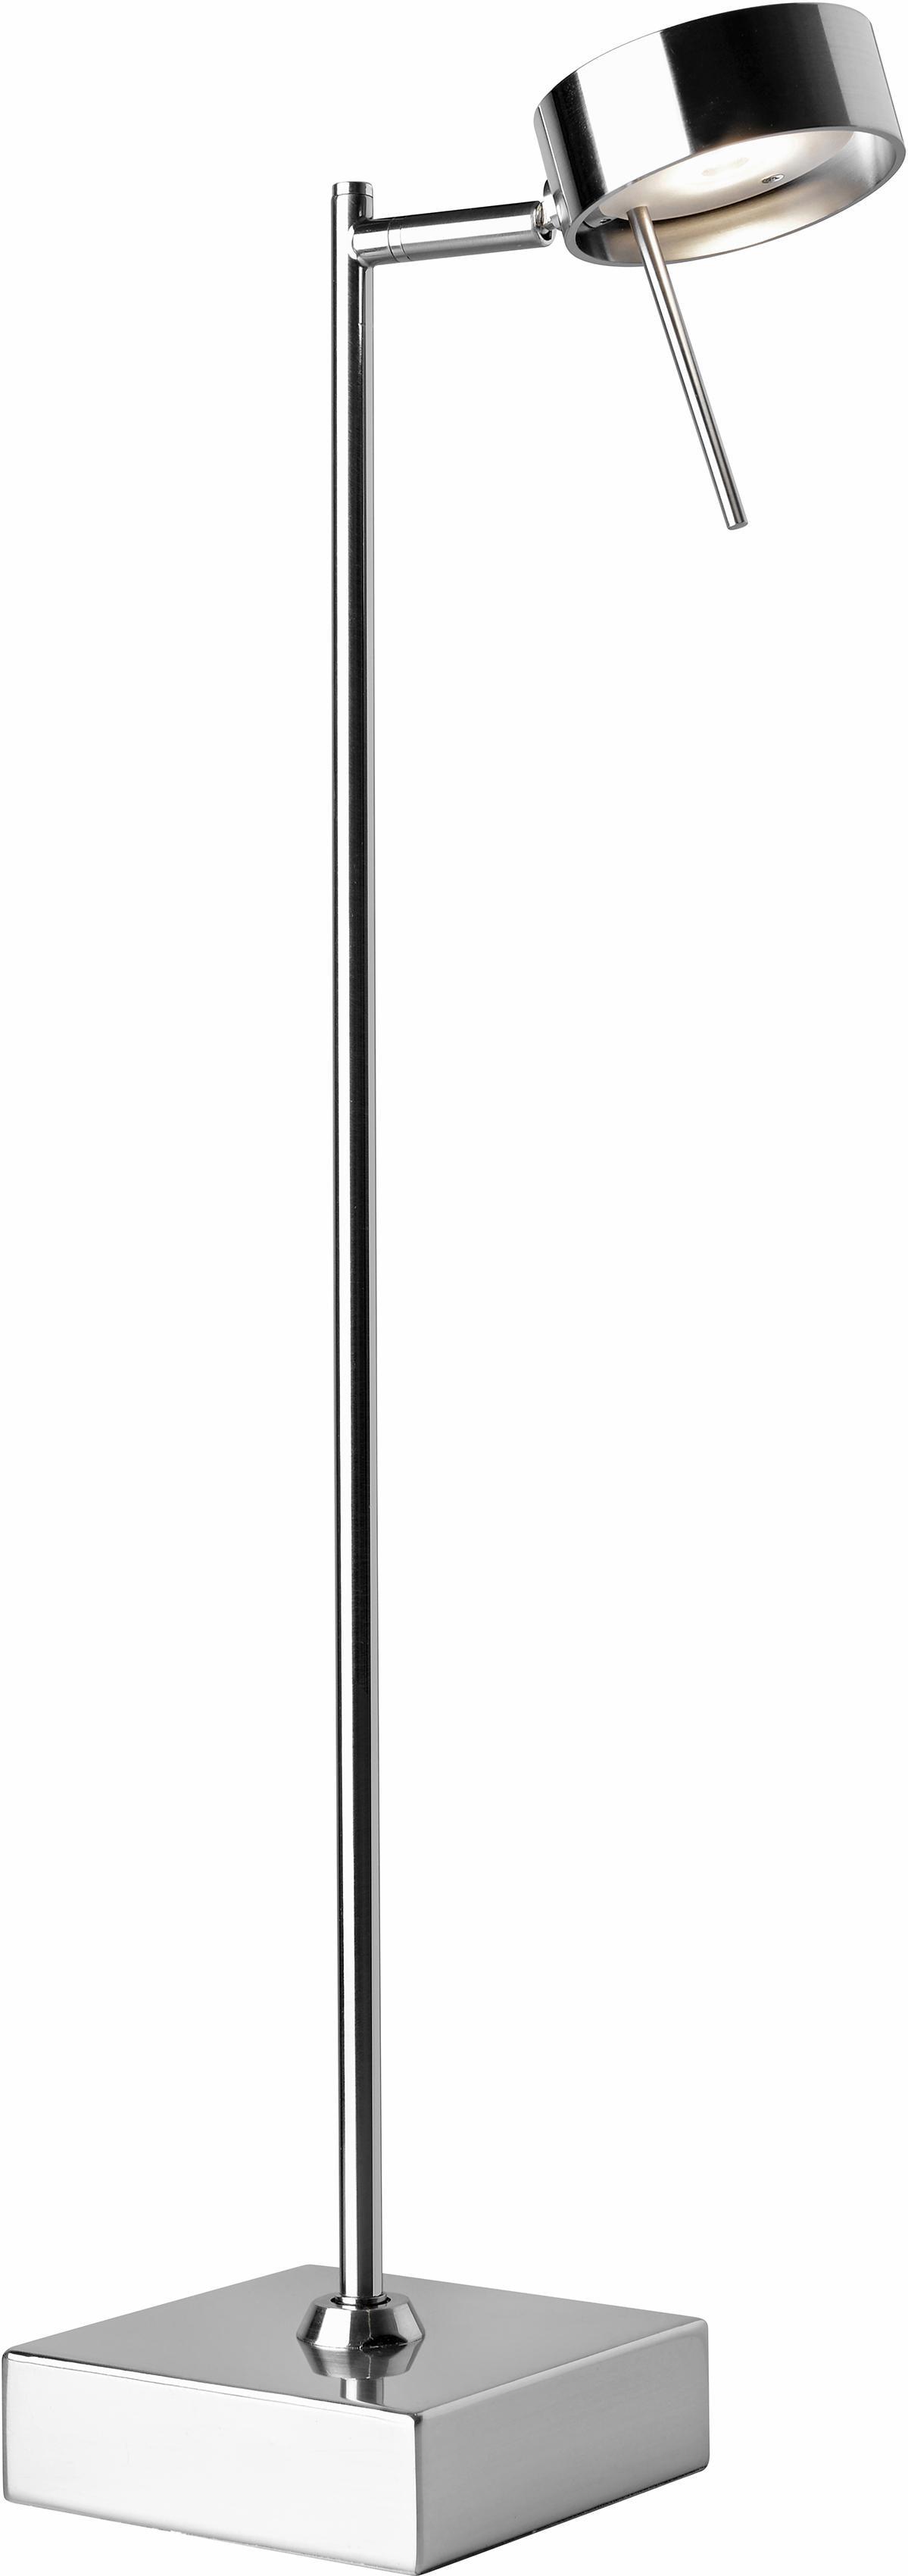 SOMPEX LED Tischleuchte BLING